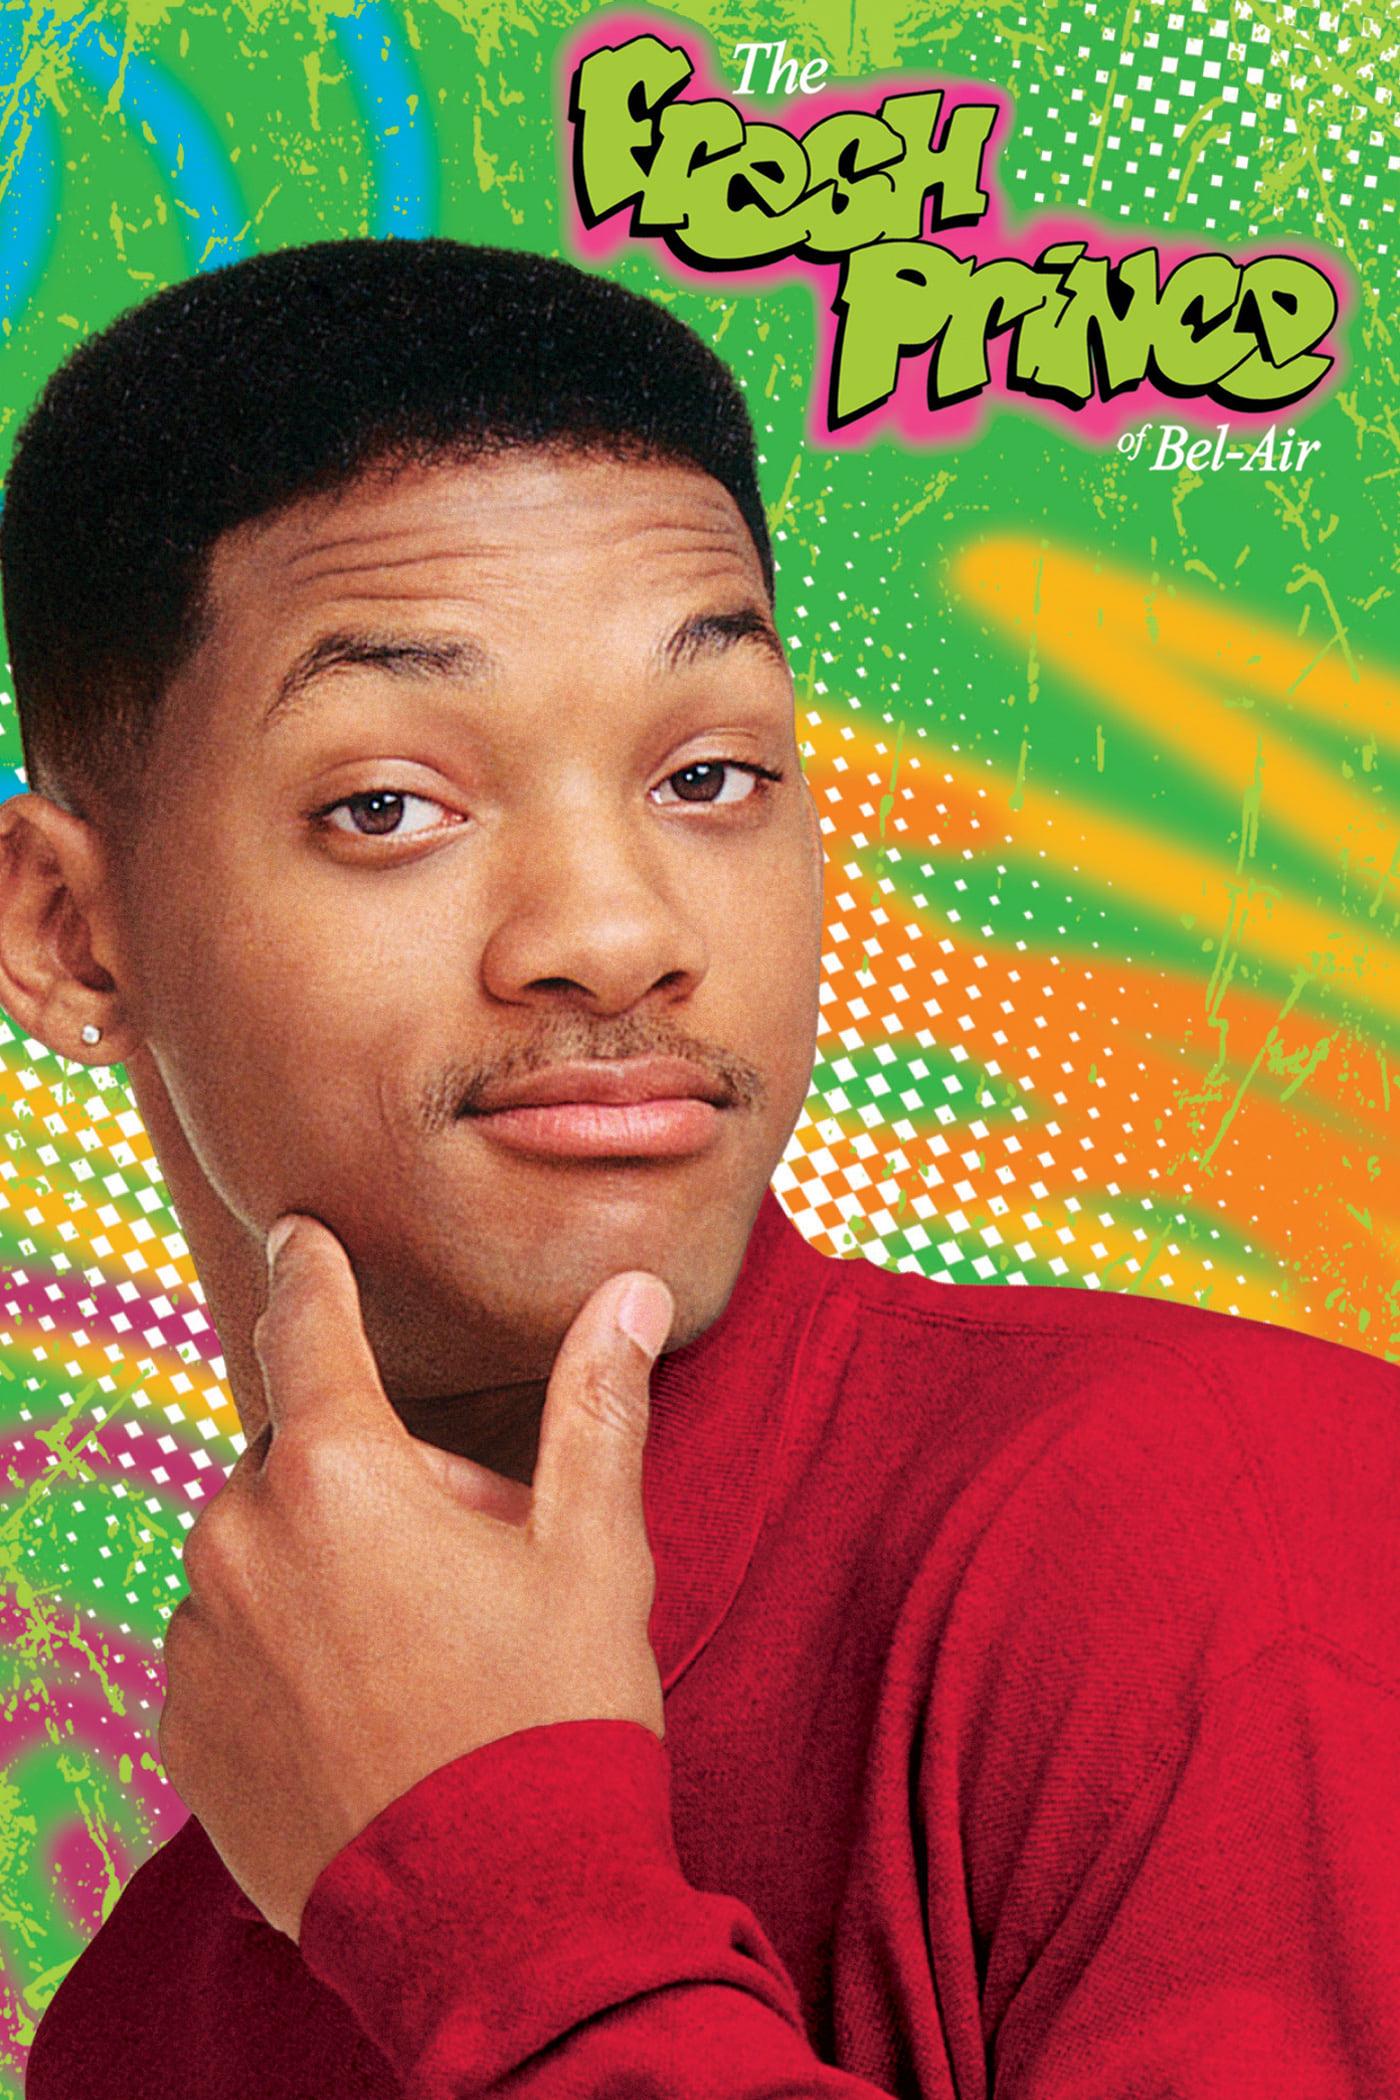 yxd_The Fresh Prince of Bel-Air Season 5 - 123movies | Watch Online Full Movies TV Series ...